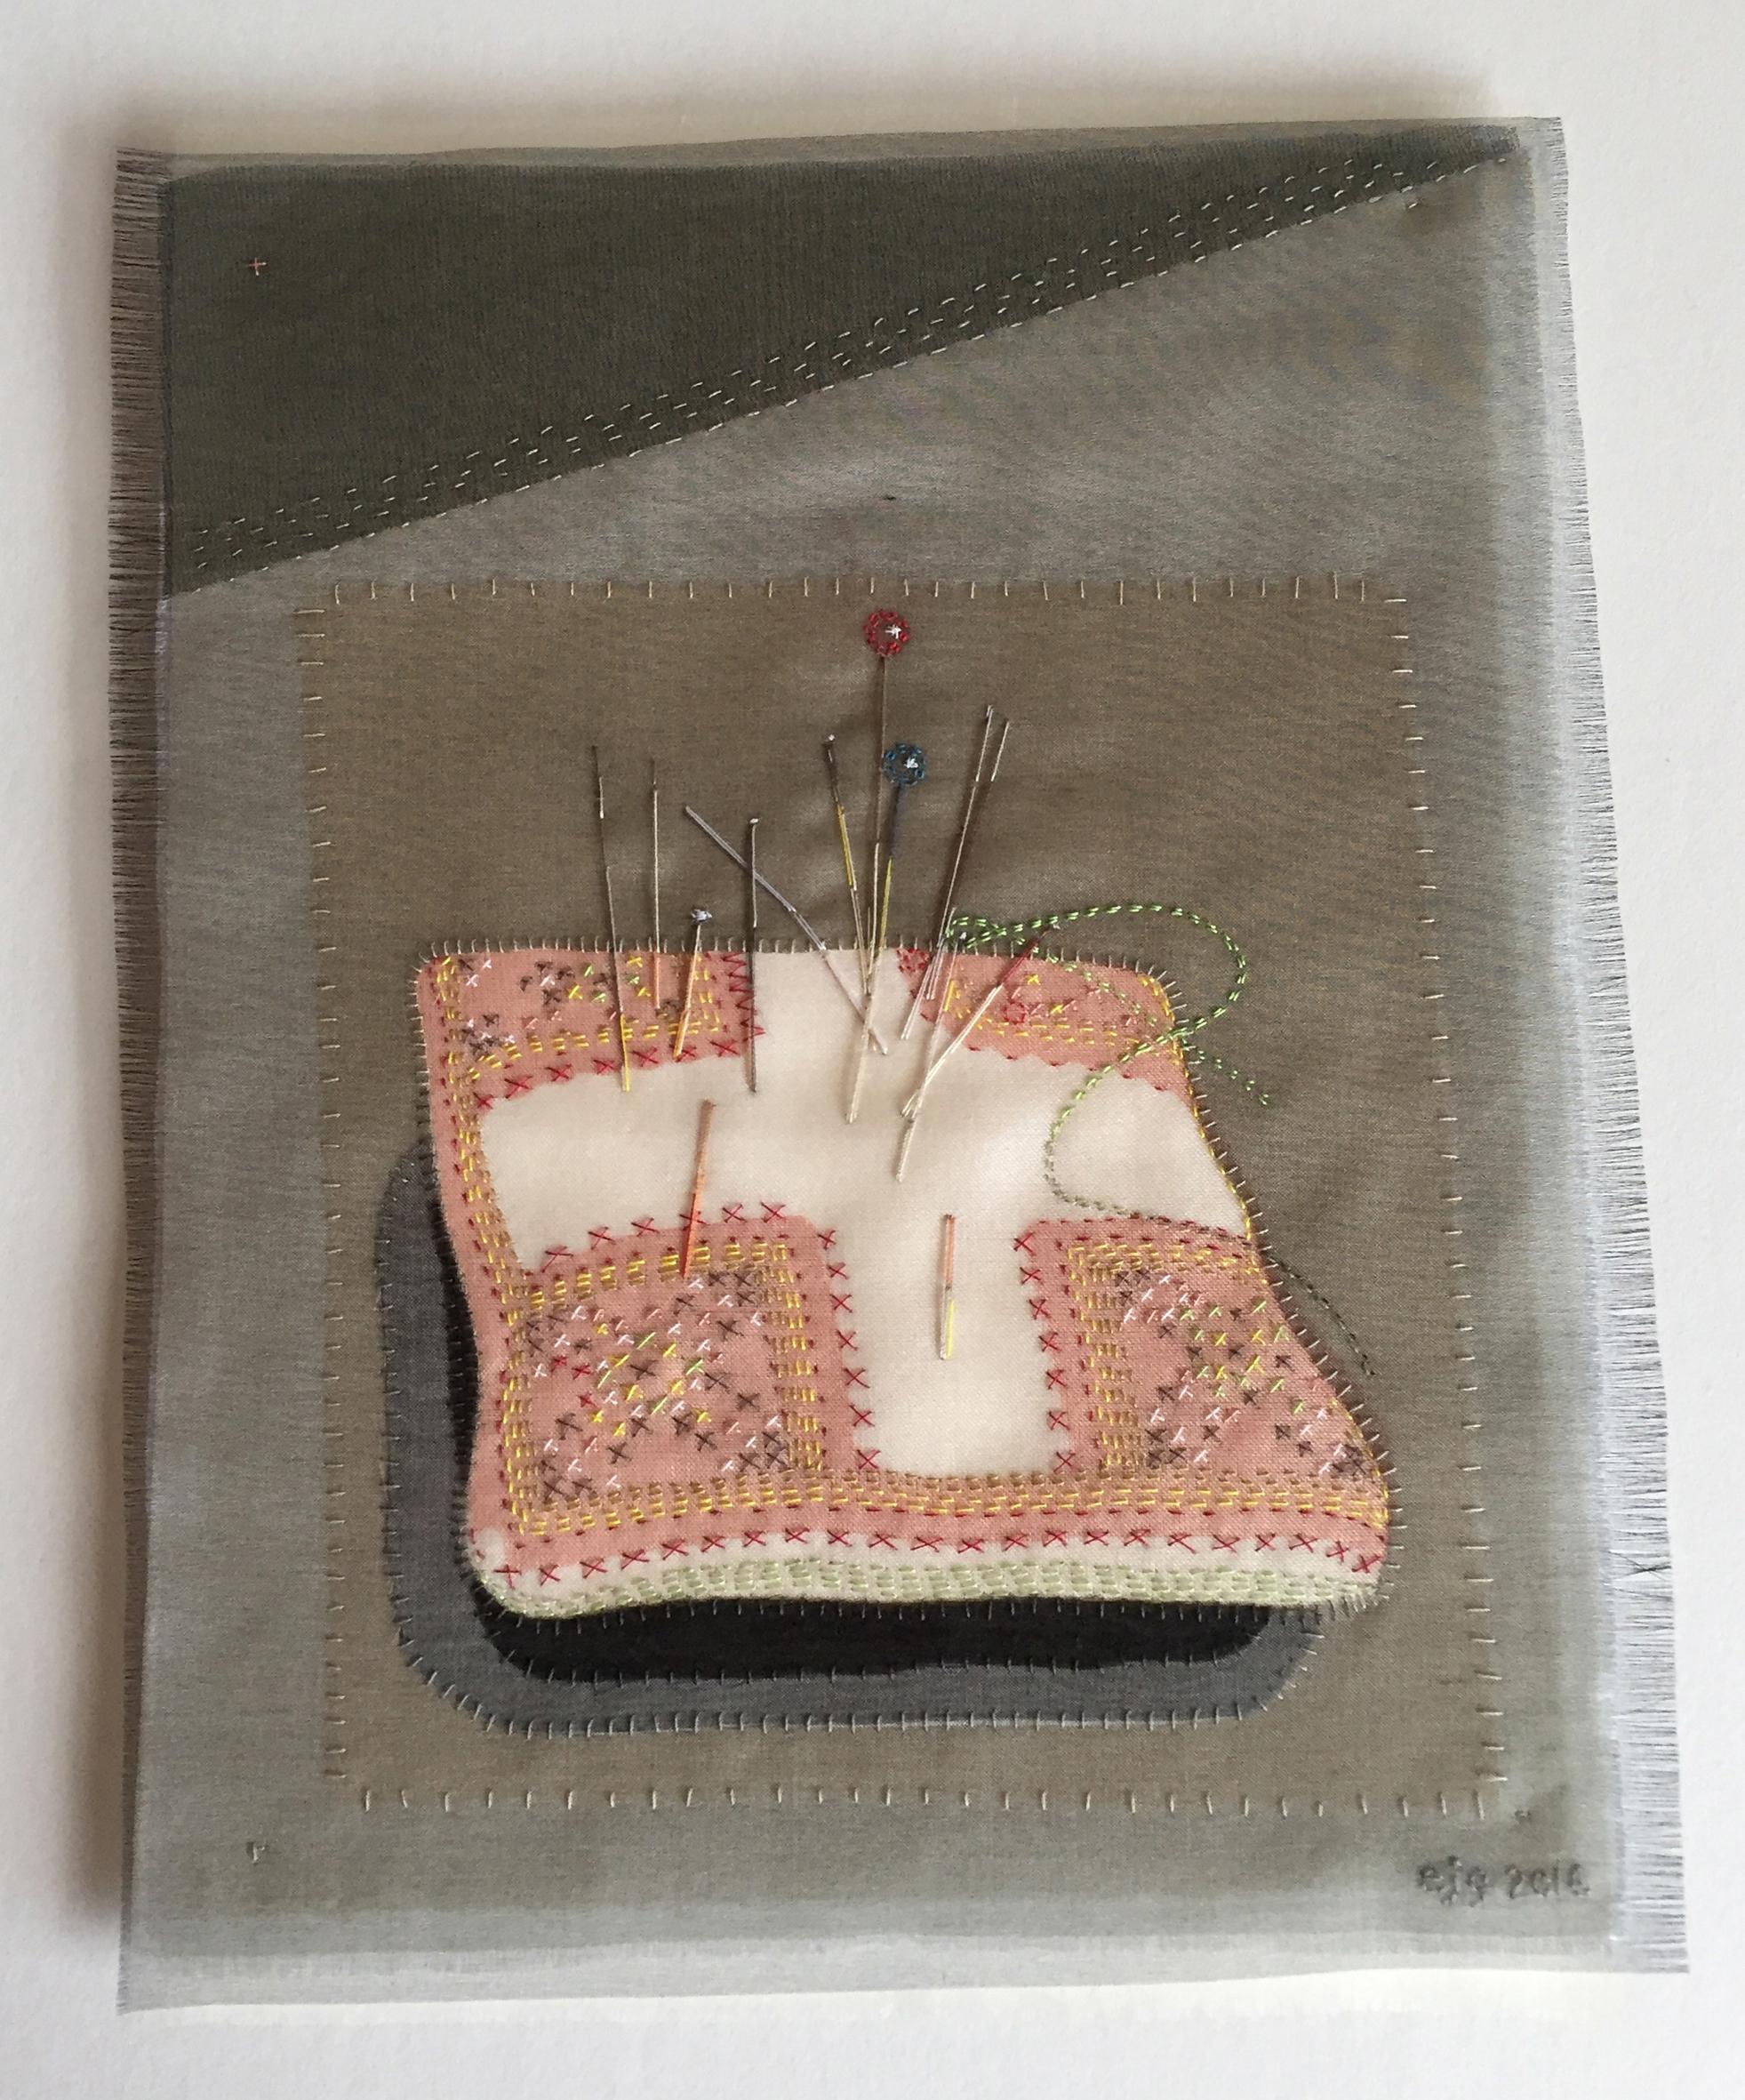 Pincushion portrait - Bridget. Silk organza appliqué, hand stitched. Oak frame size 41.5cm x 49cm - SOLD